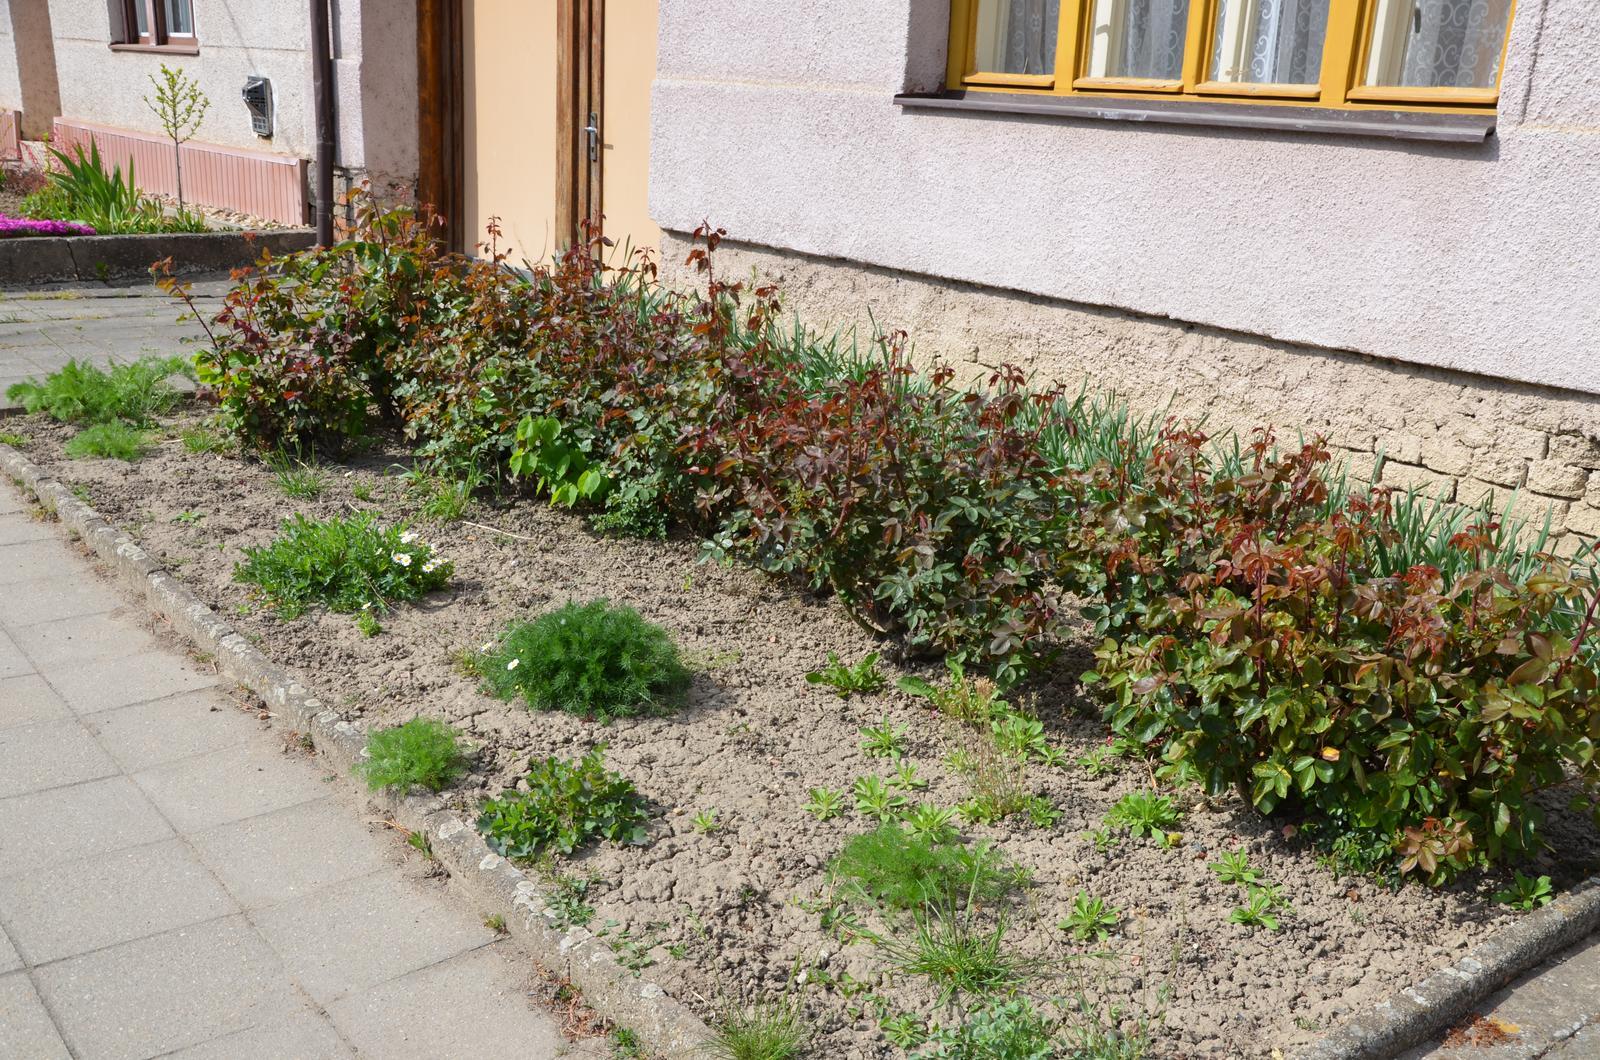 Vysněná zahrada... - druhá polovina předzahrádky